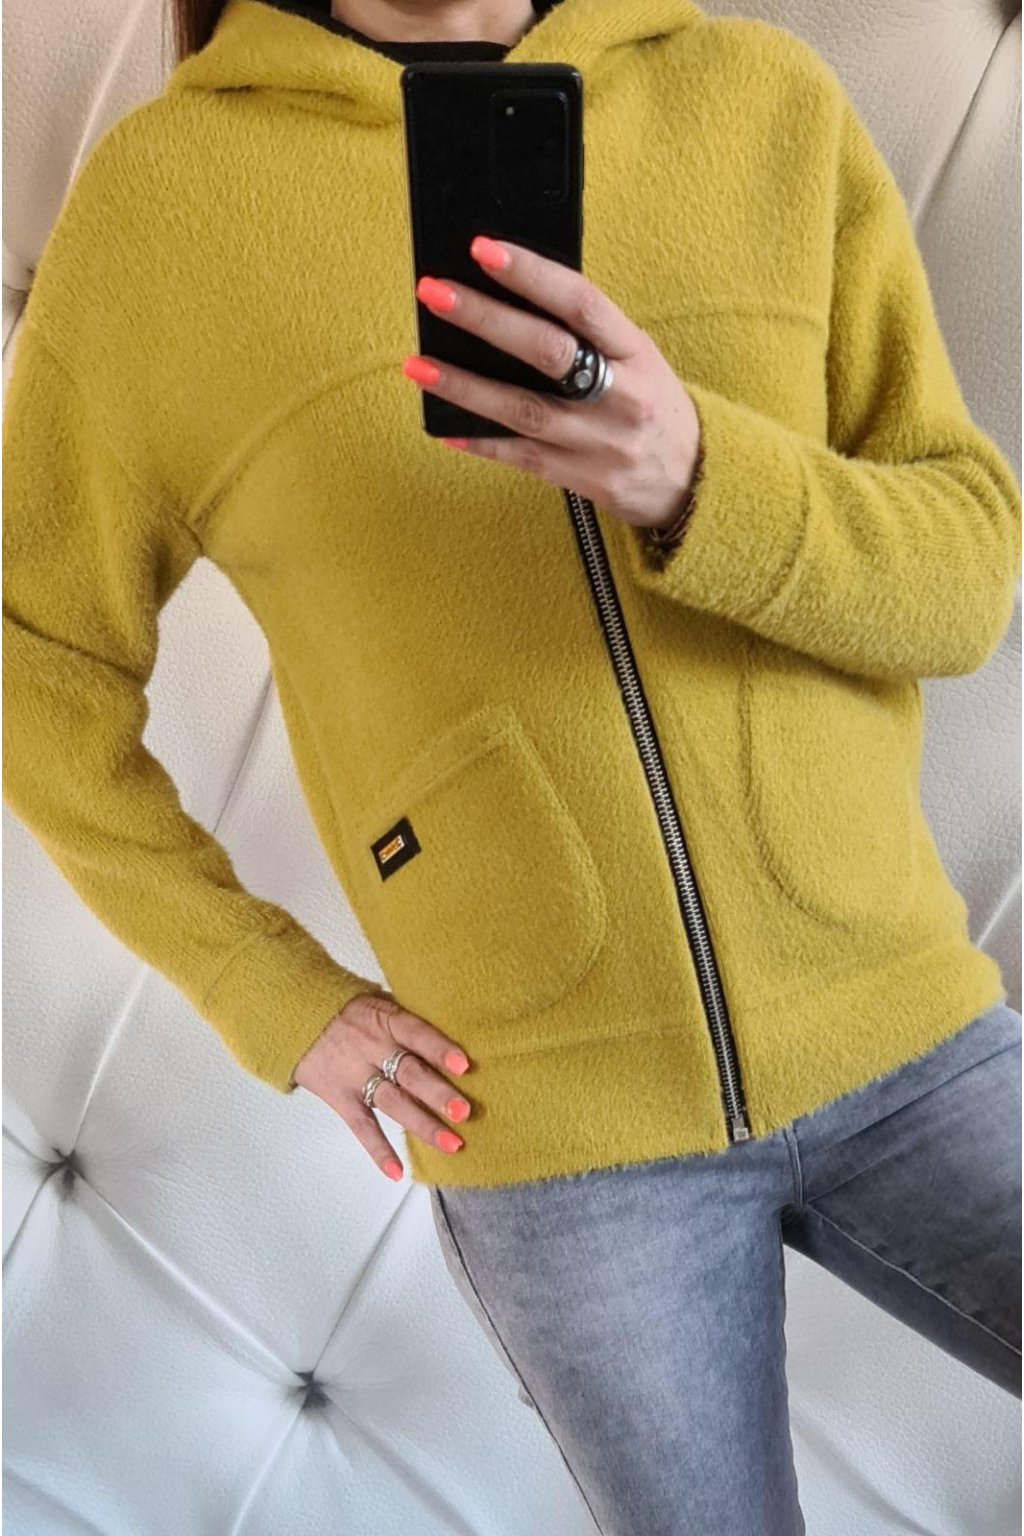 dámská bunda krátká žlutá